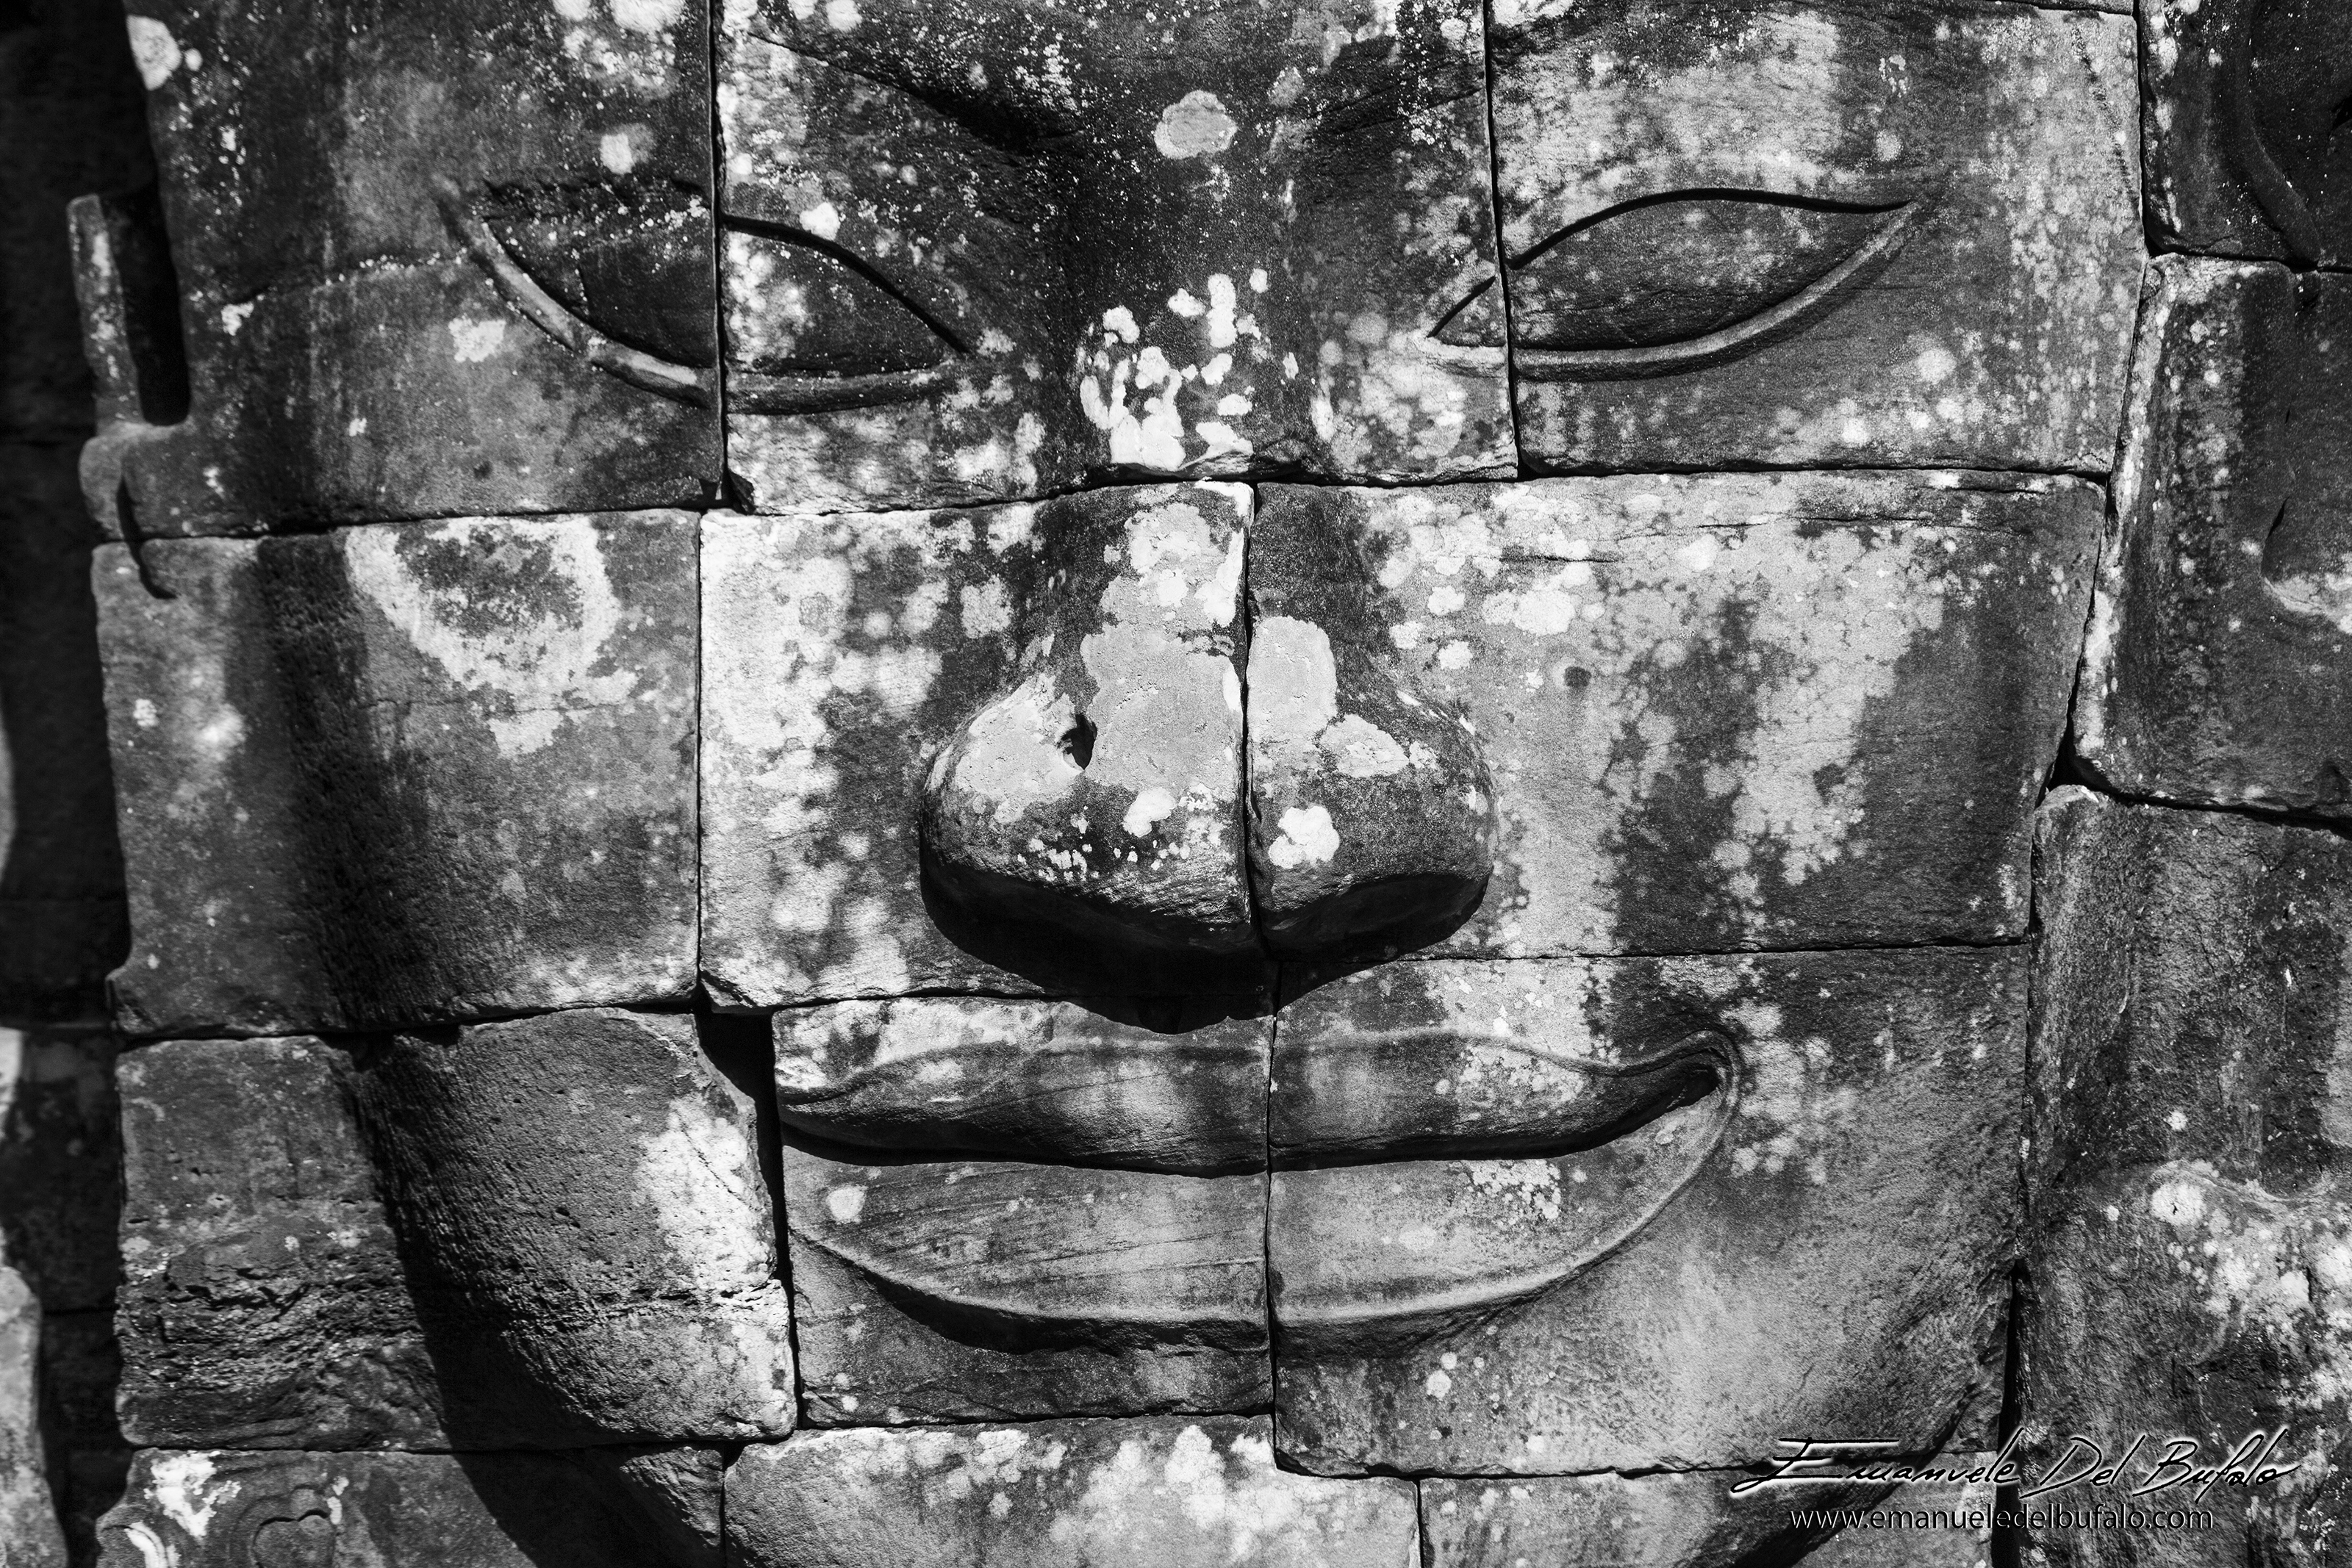 www.emanueledelbufalo.com #asia #cambodia #bayon #buddha_face #smiling #travel #B&W